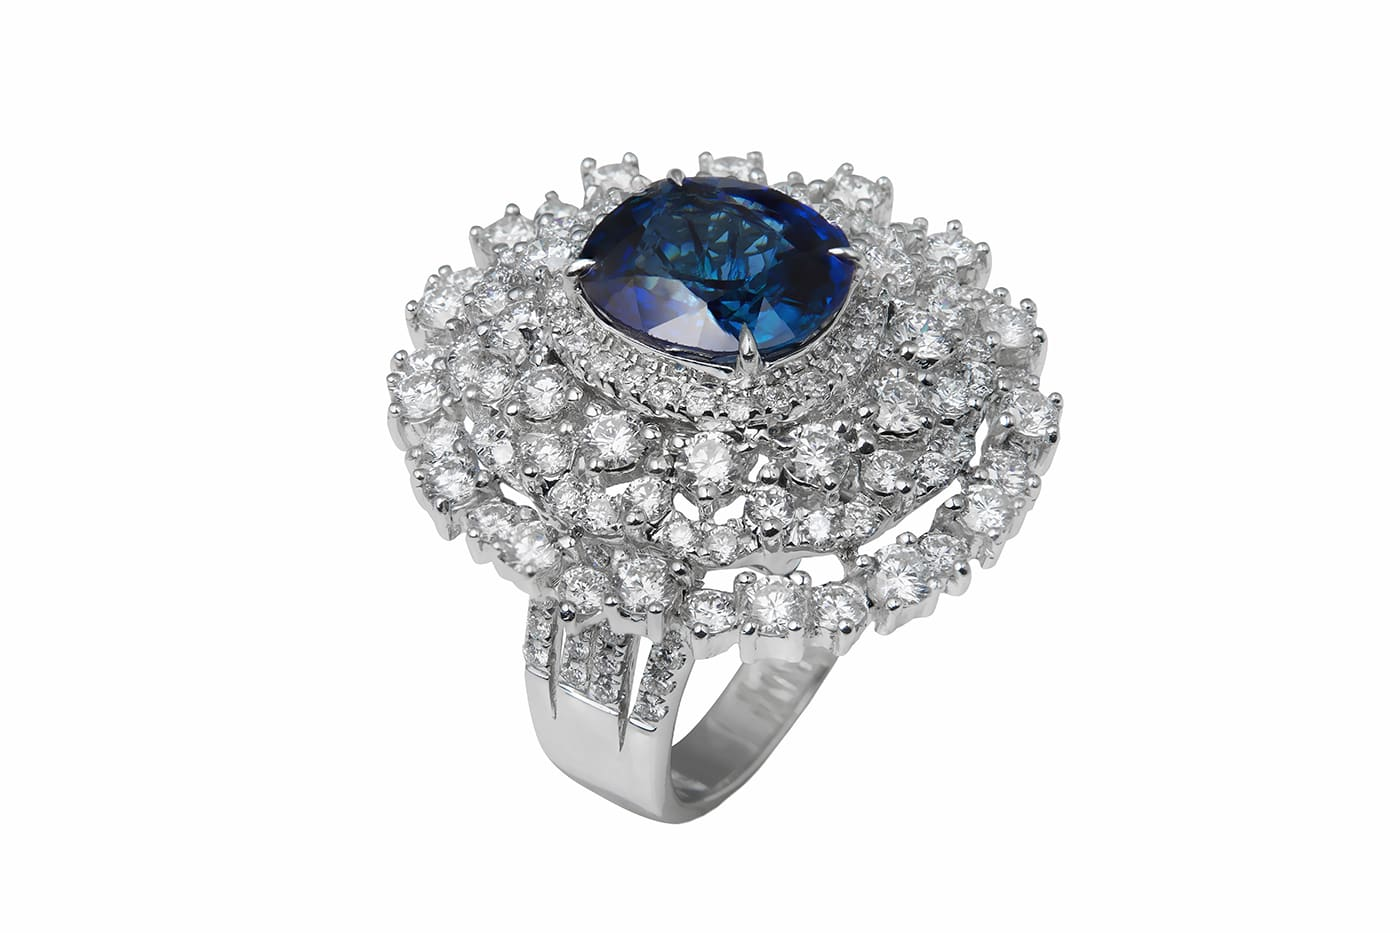 Peacock Blue Sapphire Diamond Ring